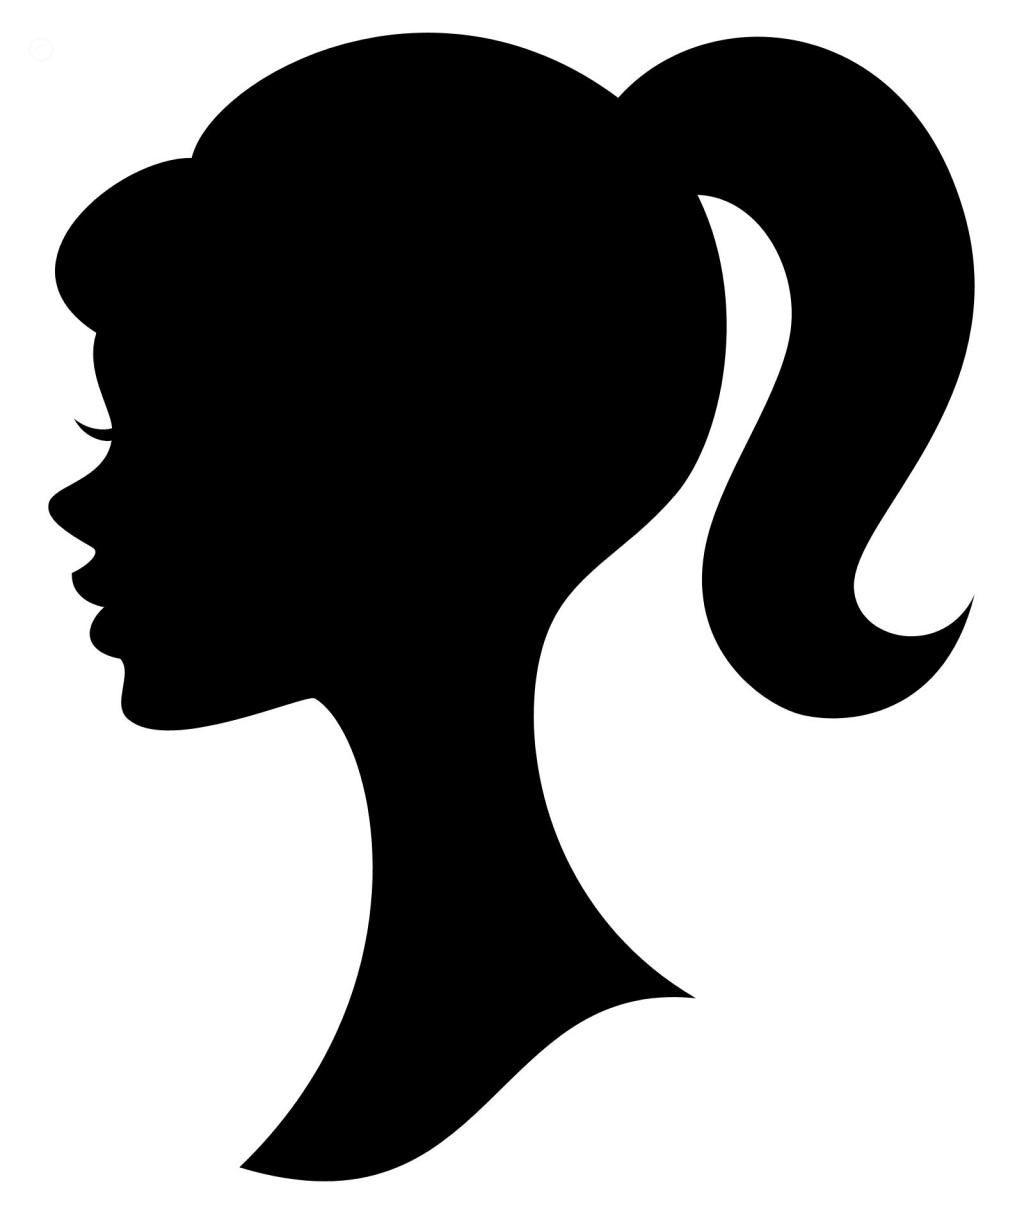 Barbie Silhouette Barbie Princess Movies | barbie | Pinterest | 15 ...